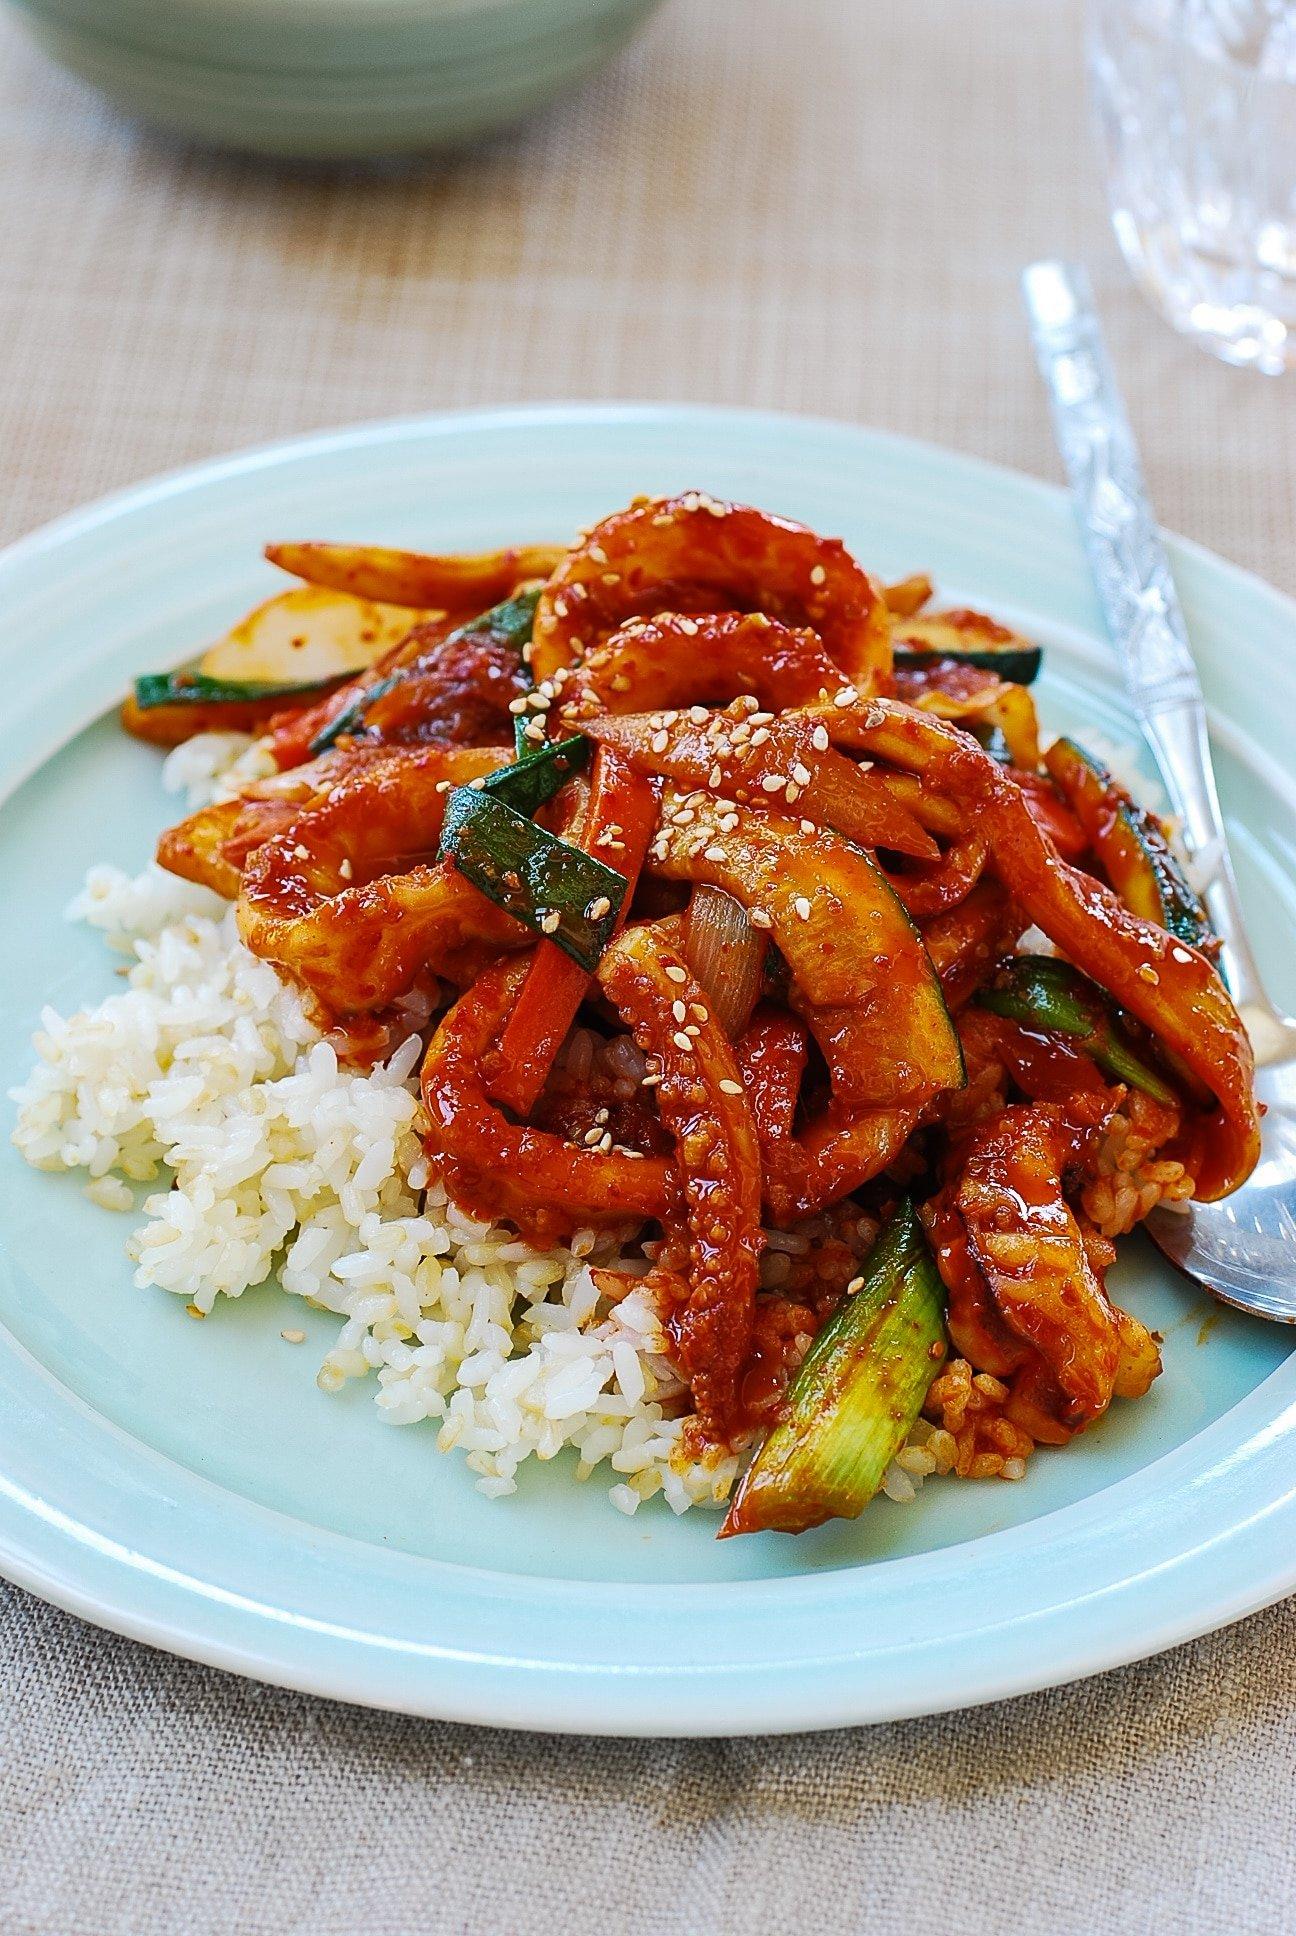 DSC 0047 - Ojingeo Bokkeum (Korean Spicy Stir-fried Squid)